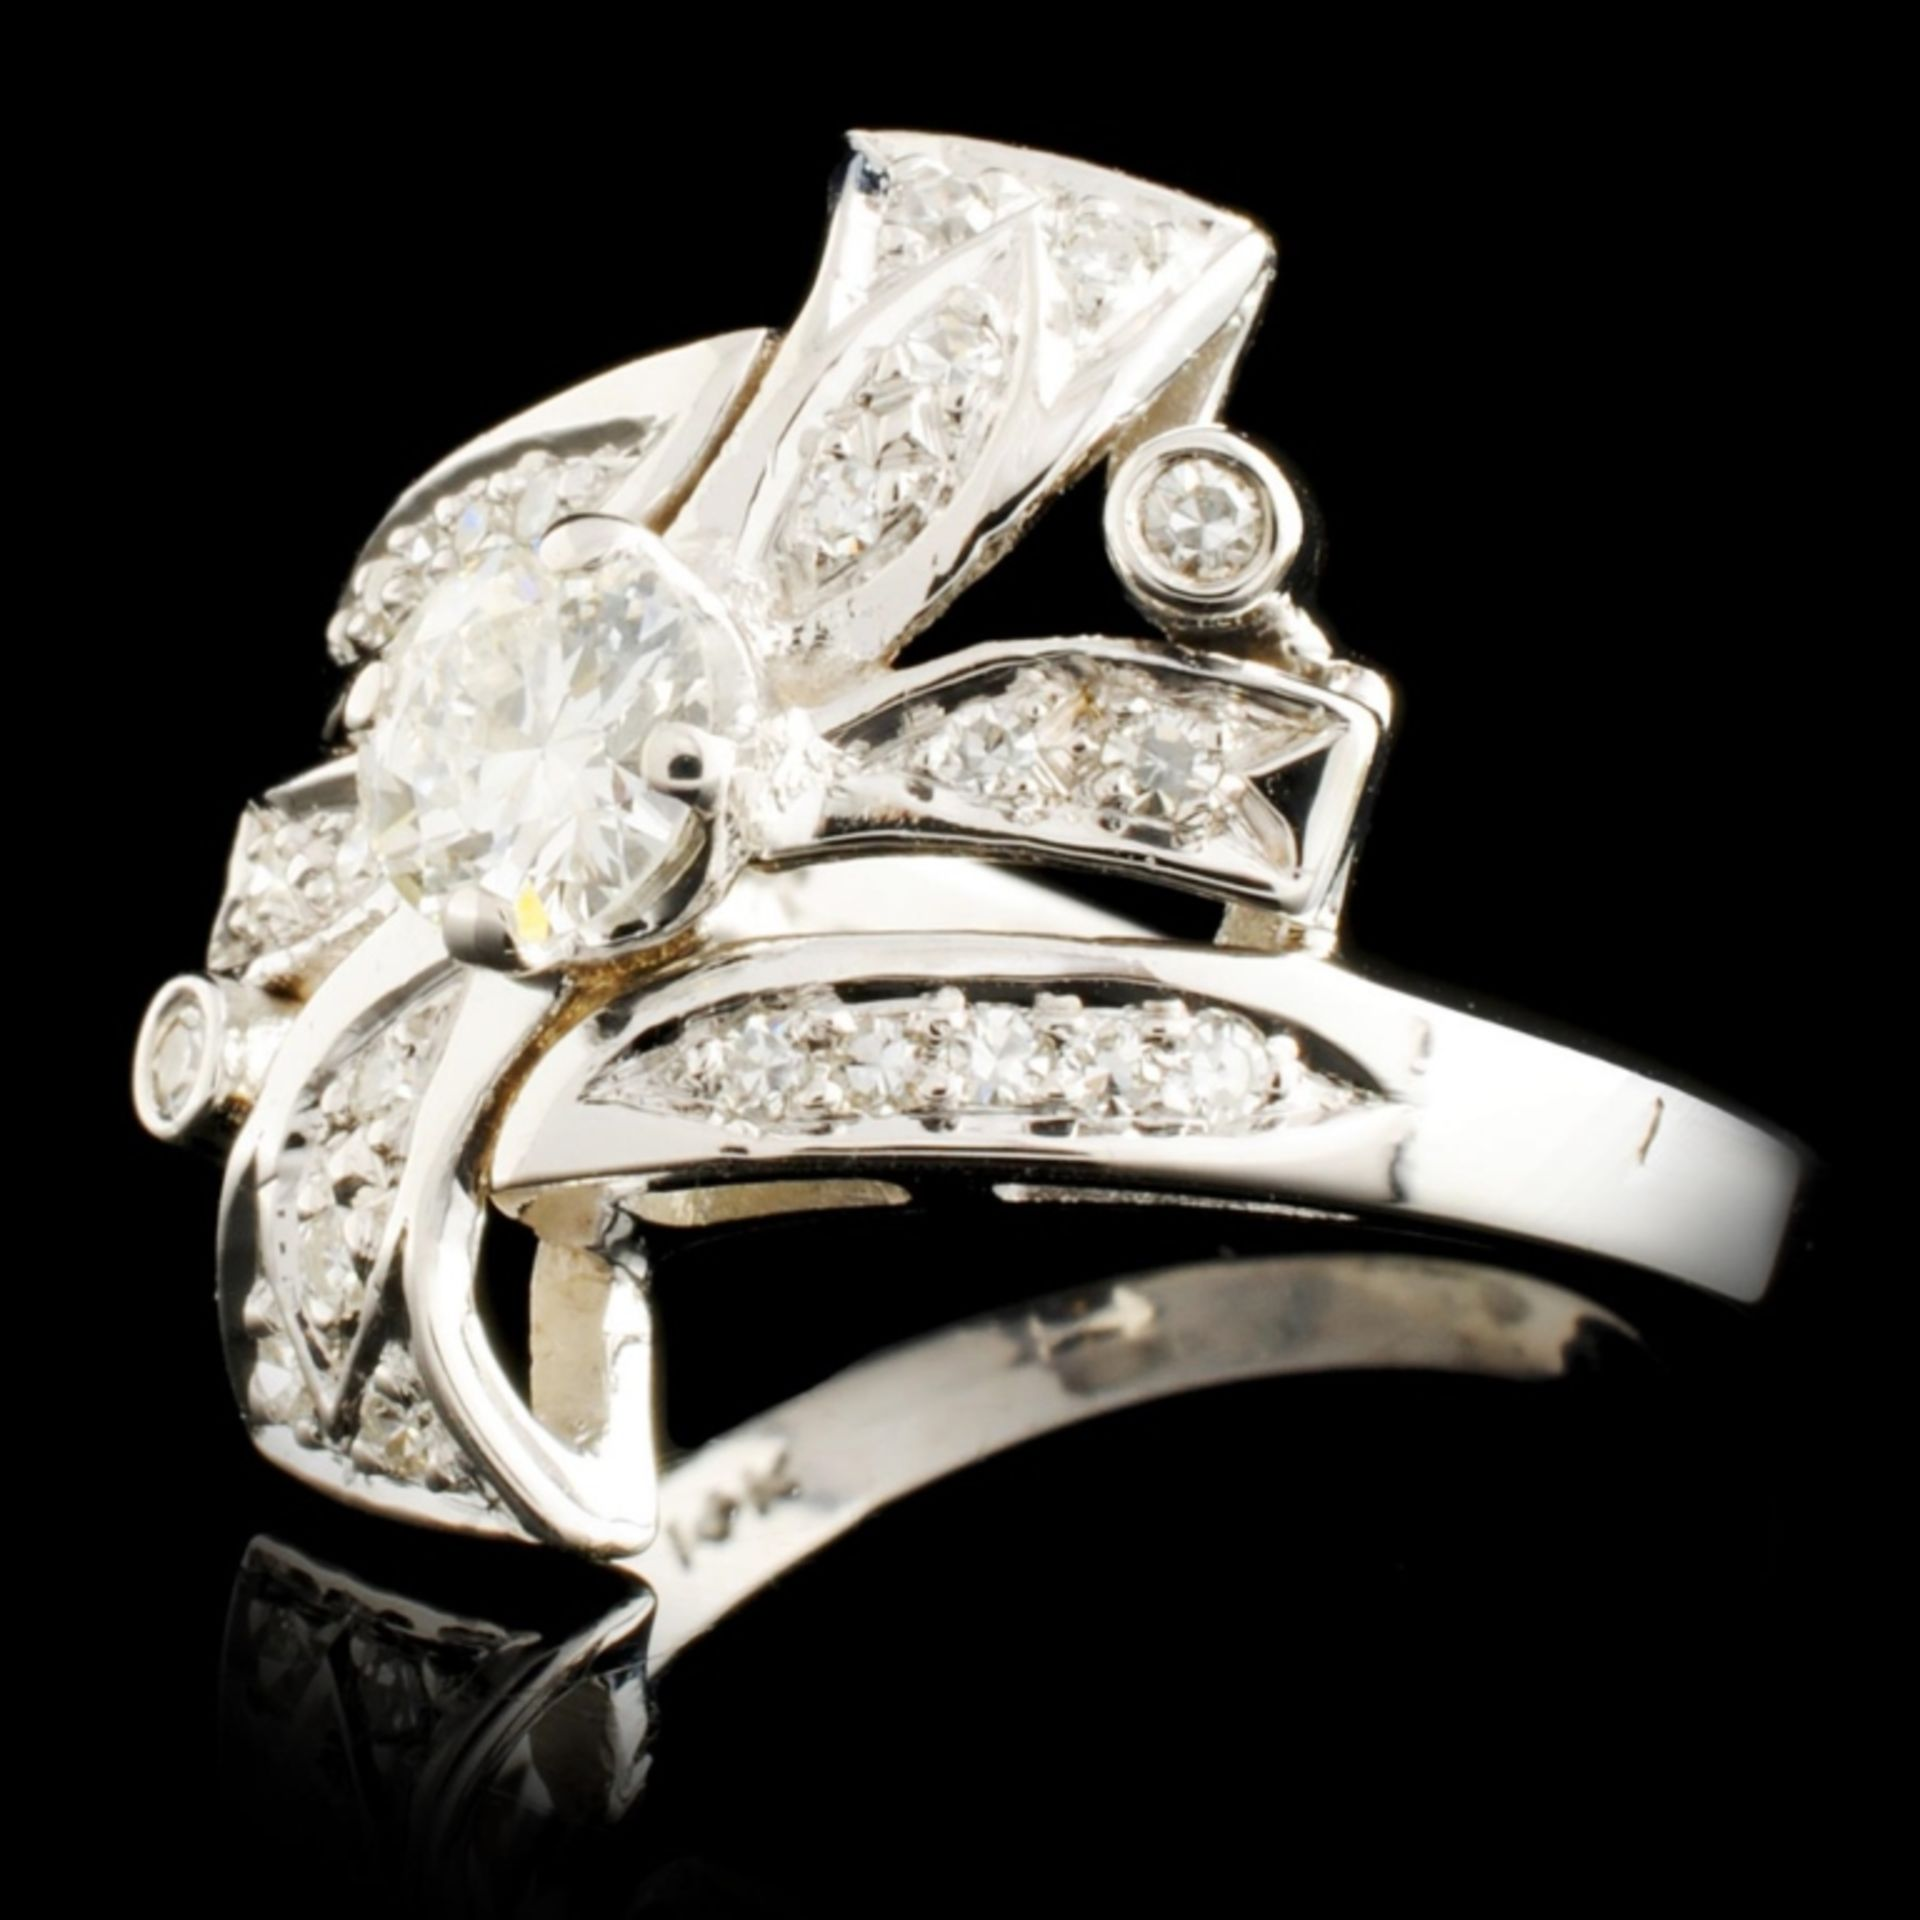 14K Gold 0.85ctw Diamond Ring - Image 2 of 5